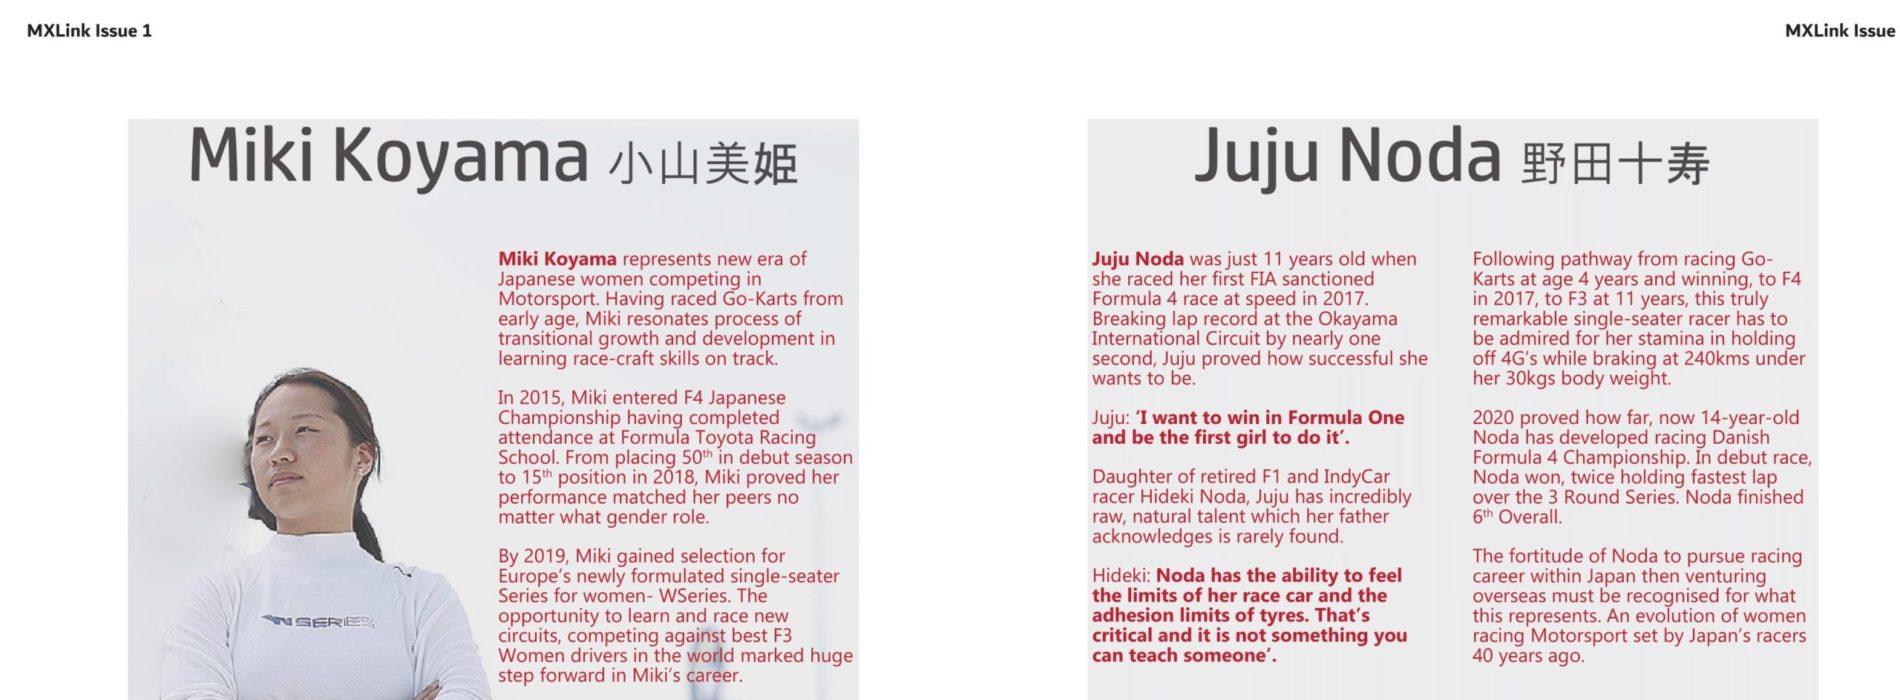 Japanese Women competing in Motorsport